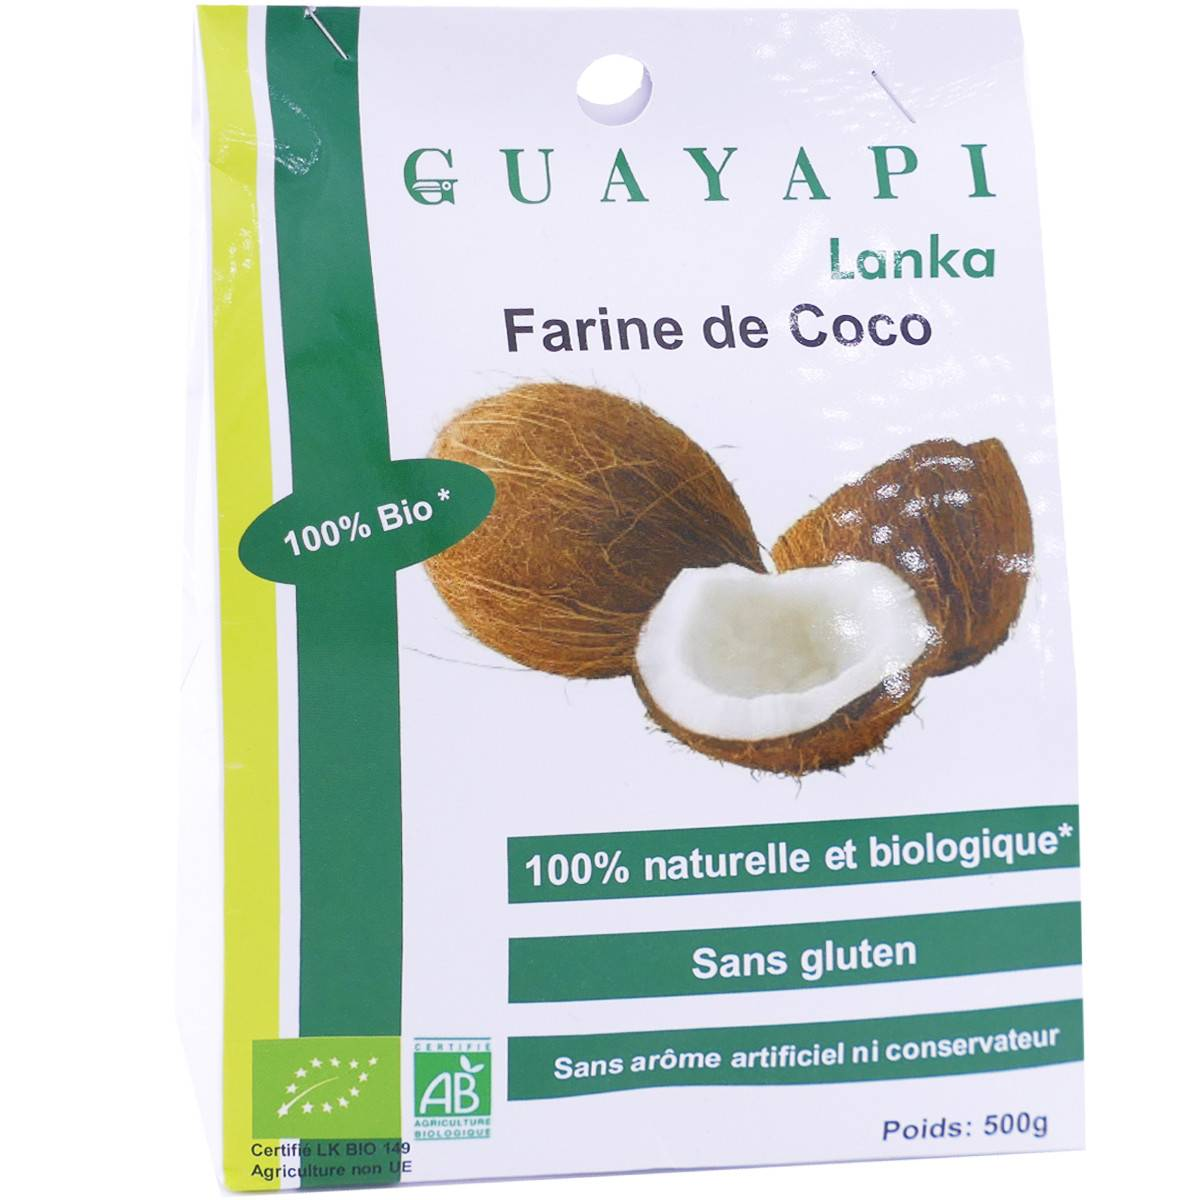 Guayapi lanka farine de coco 500 g